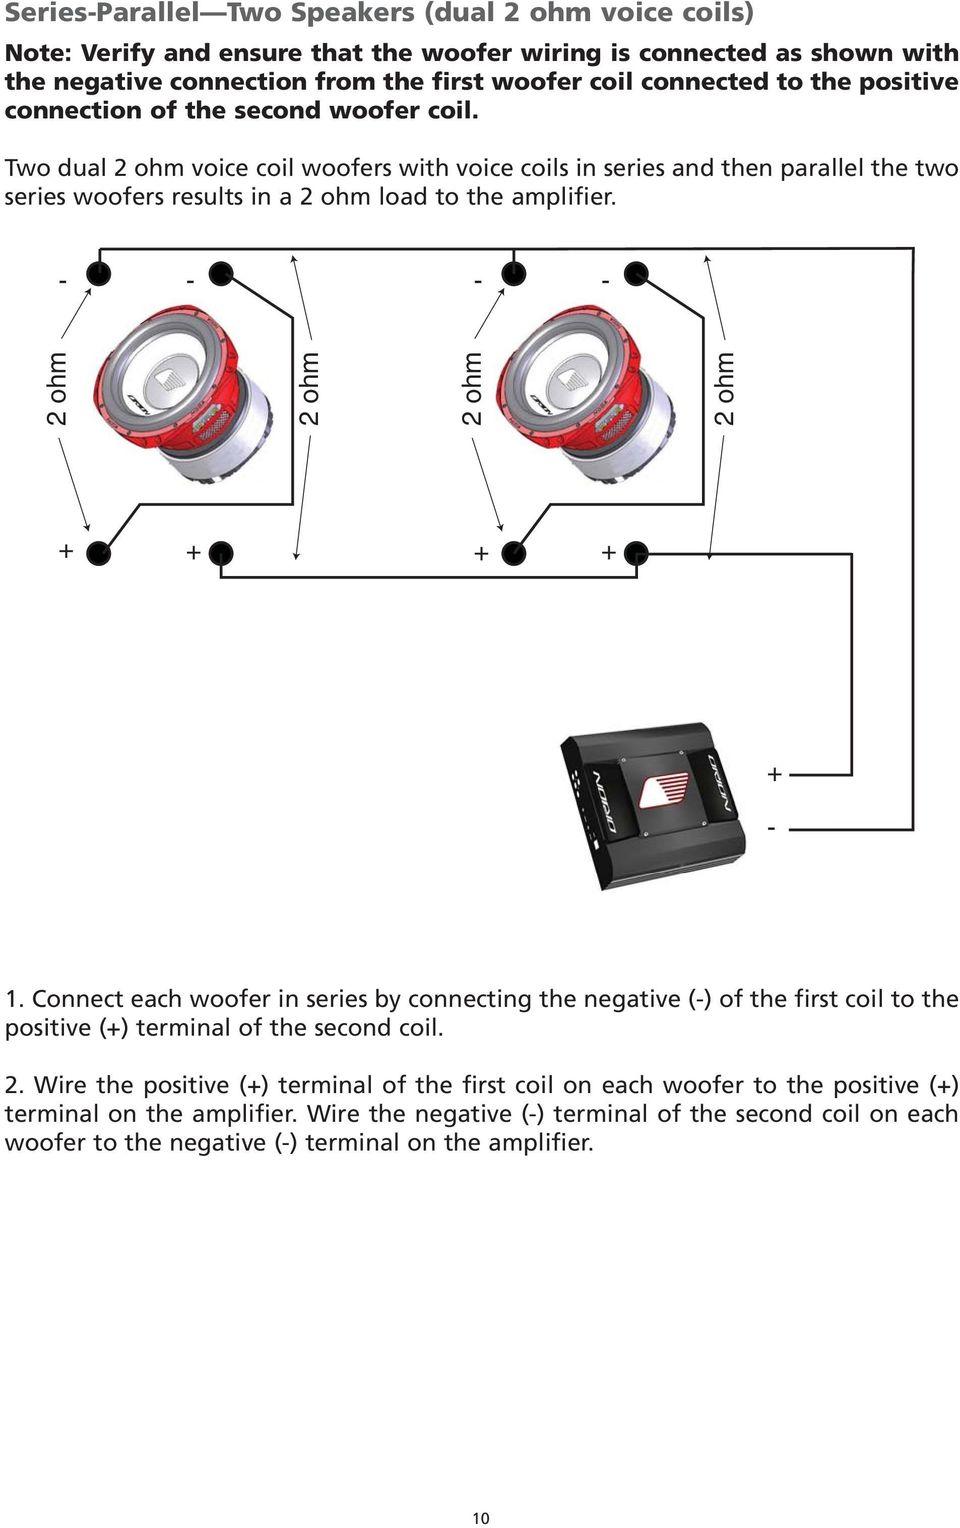 medium resolution of orion hcca 15 wiring diagram wiring diagram datasourcesubwoofer hcca pdf orion hcca 15 wiring diagram